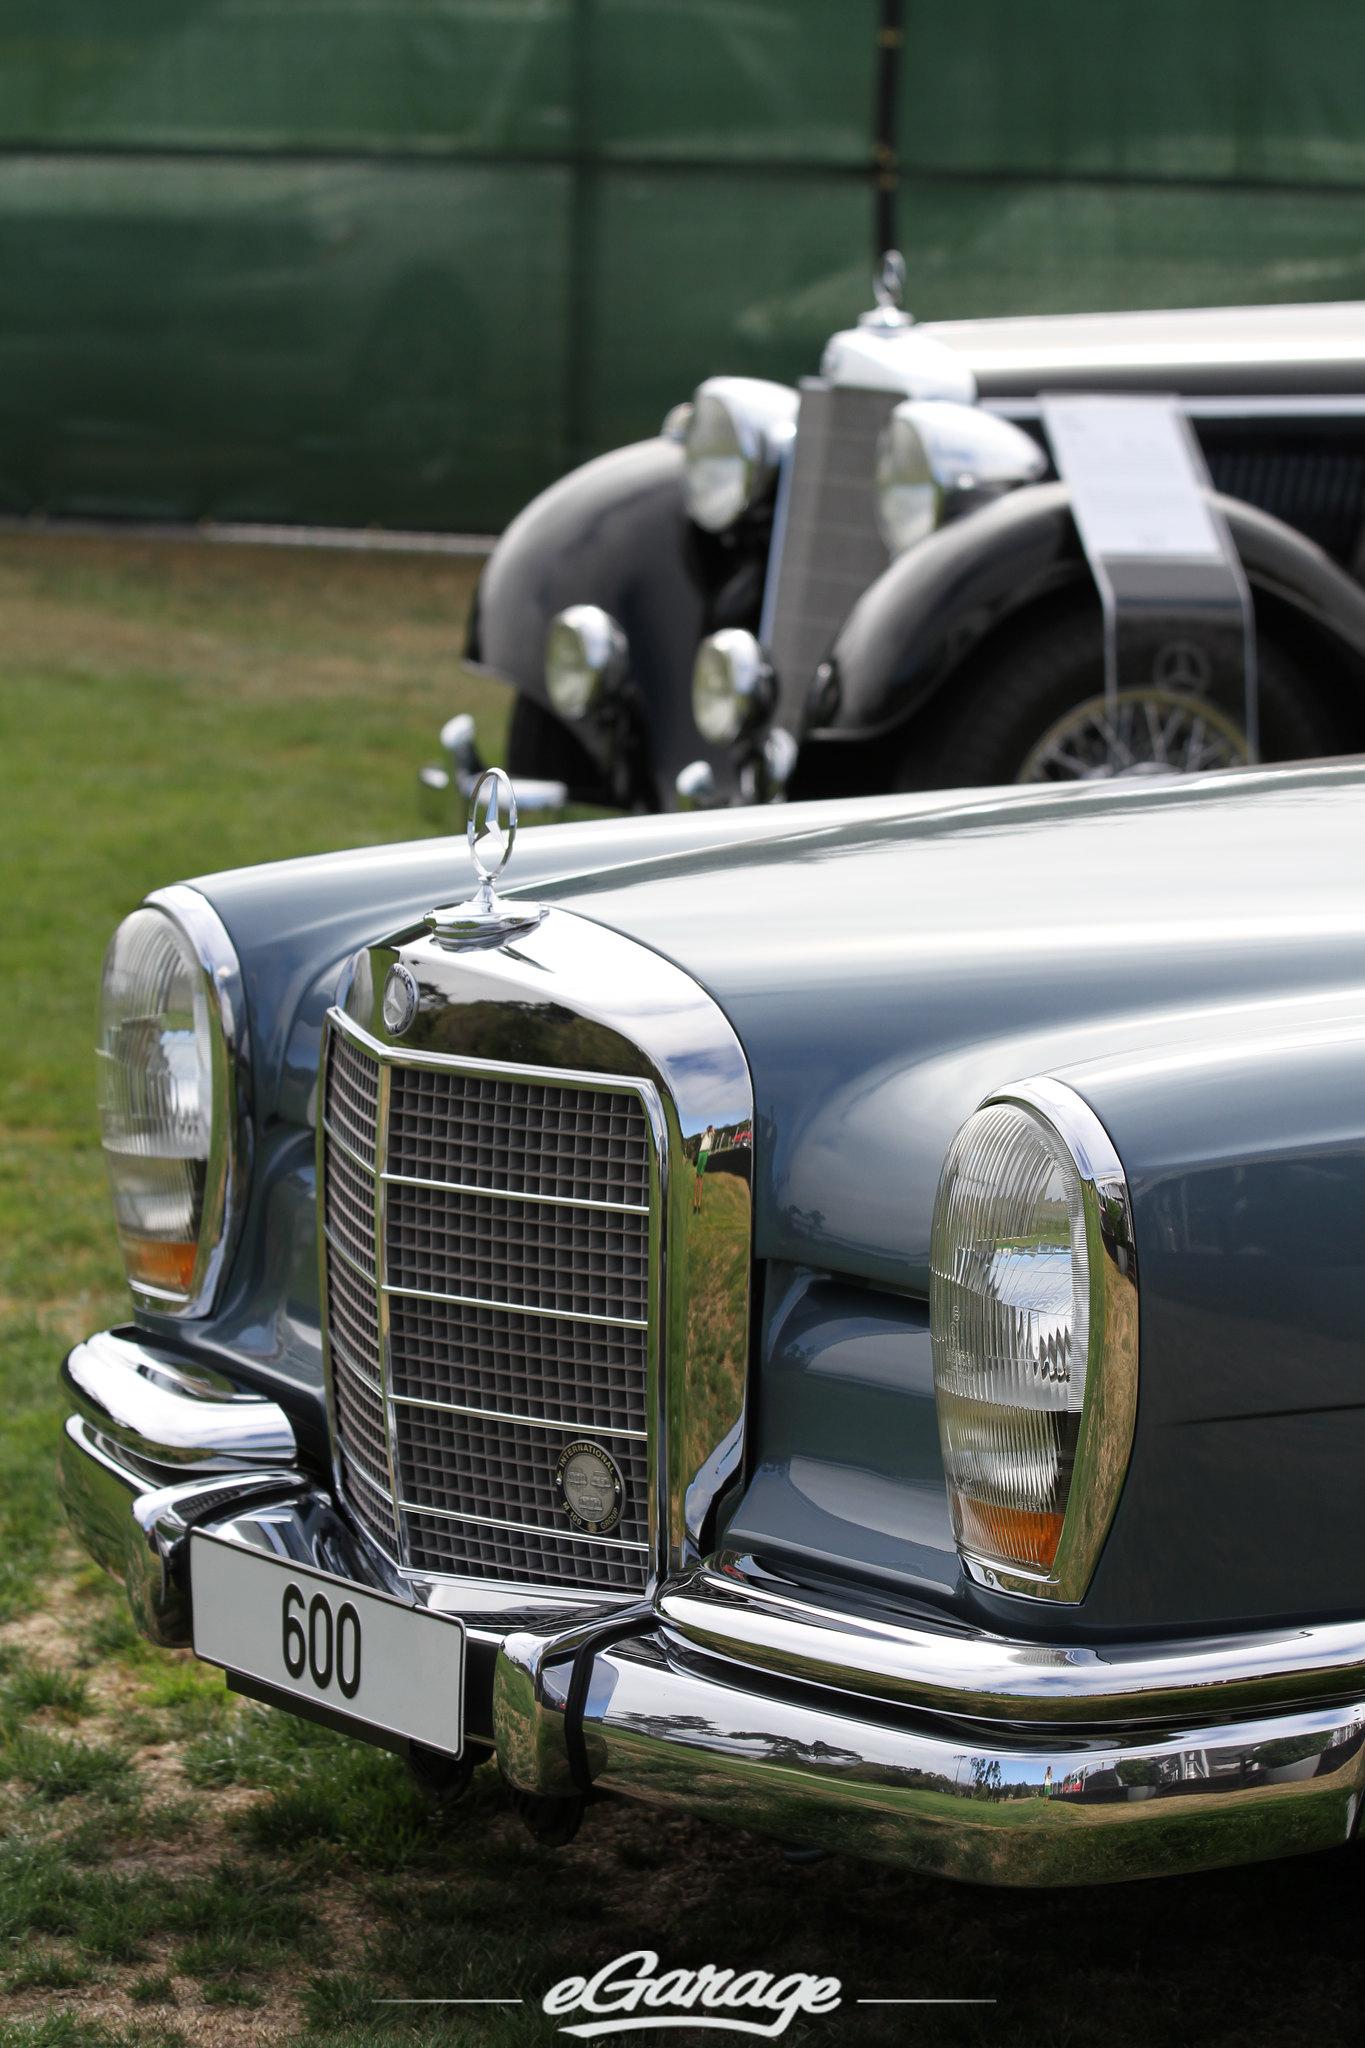 7828742972 2cb55cedf0 k Mercedes Benz Classic